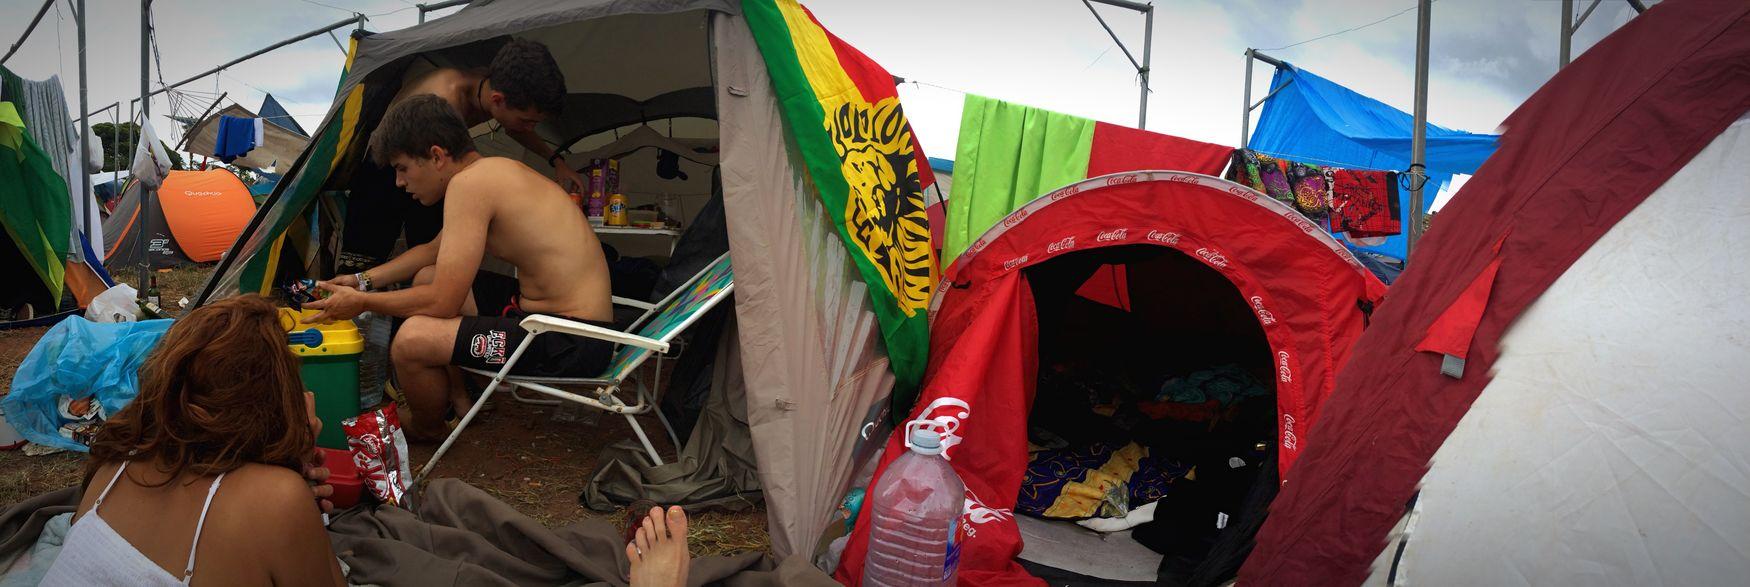 Enjoying Life Love RASTA Weed Rototomsunsplash Rototom Smoke Weed Campinglife Friends Camping Out